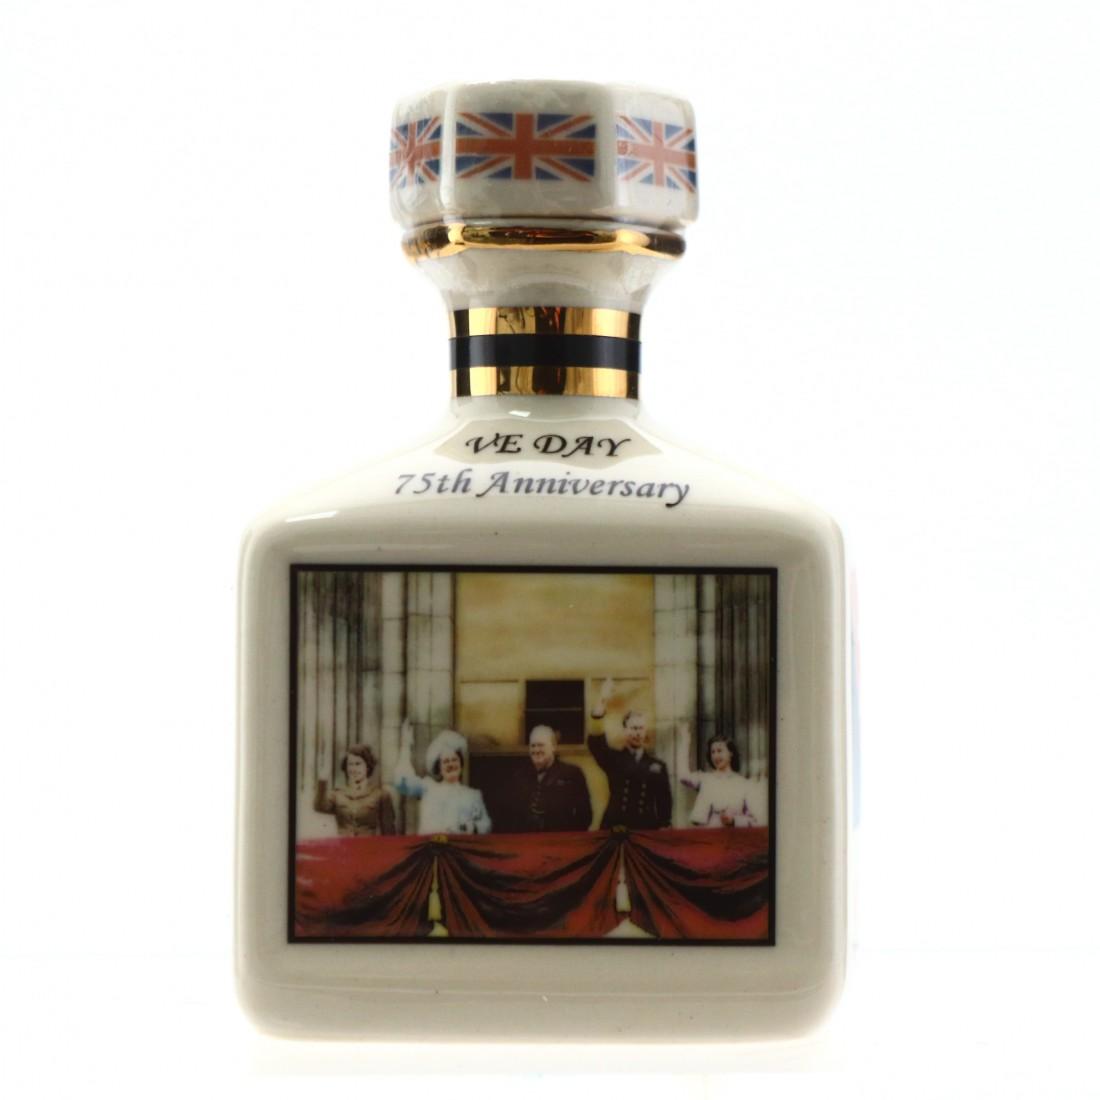 Macallan Pointers Ceramic Miniature / V.E. Day